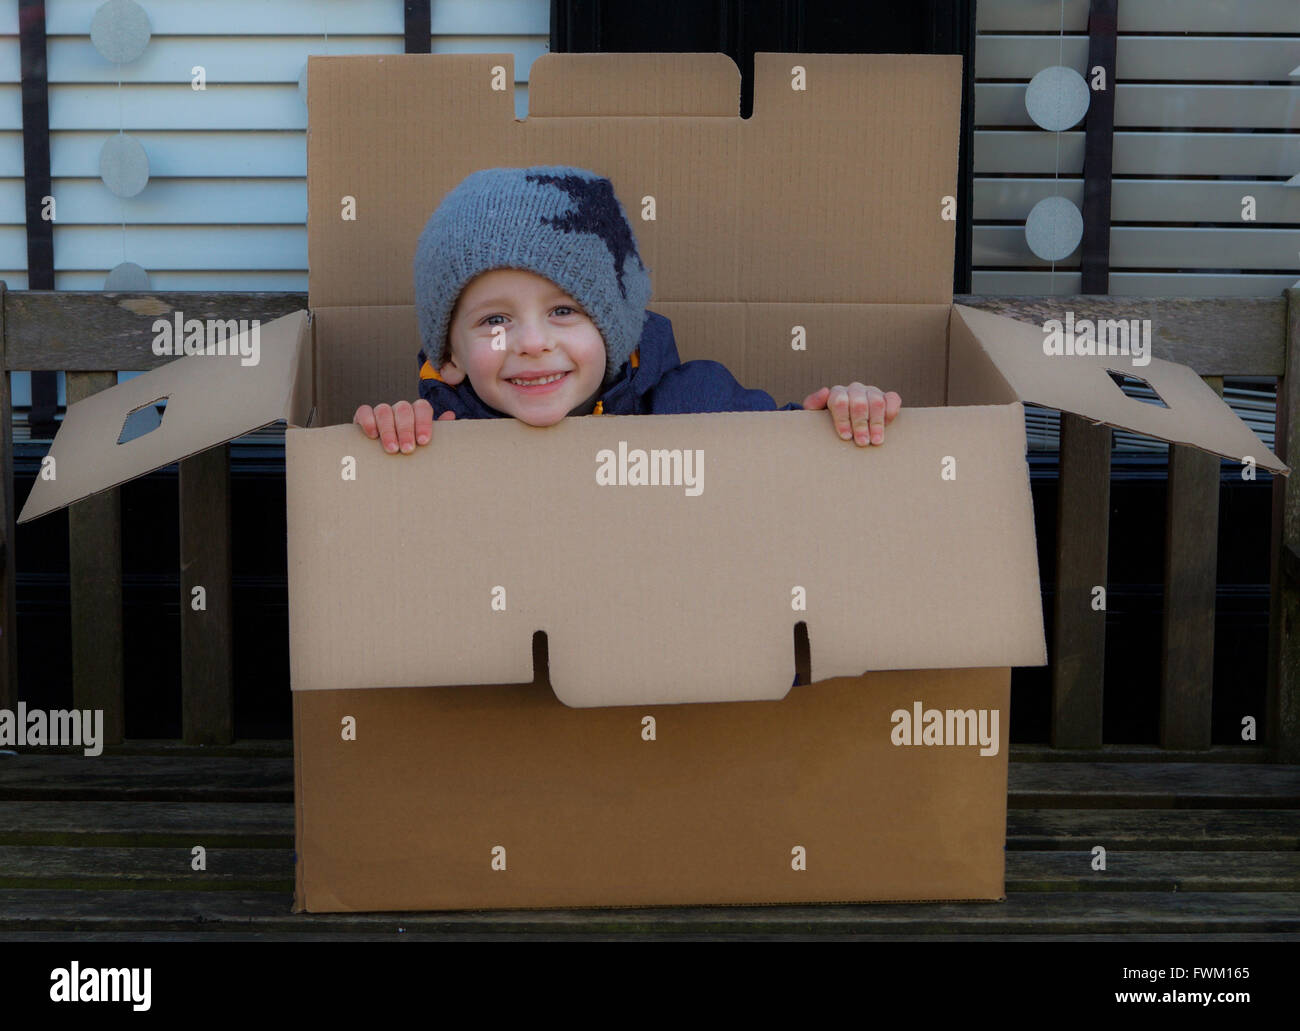 Portrait Of Playful Boy On Box - Stock Image